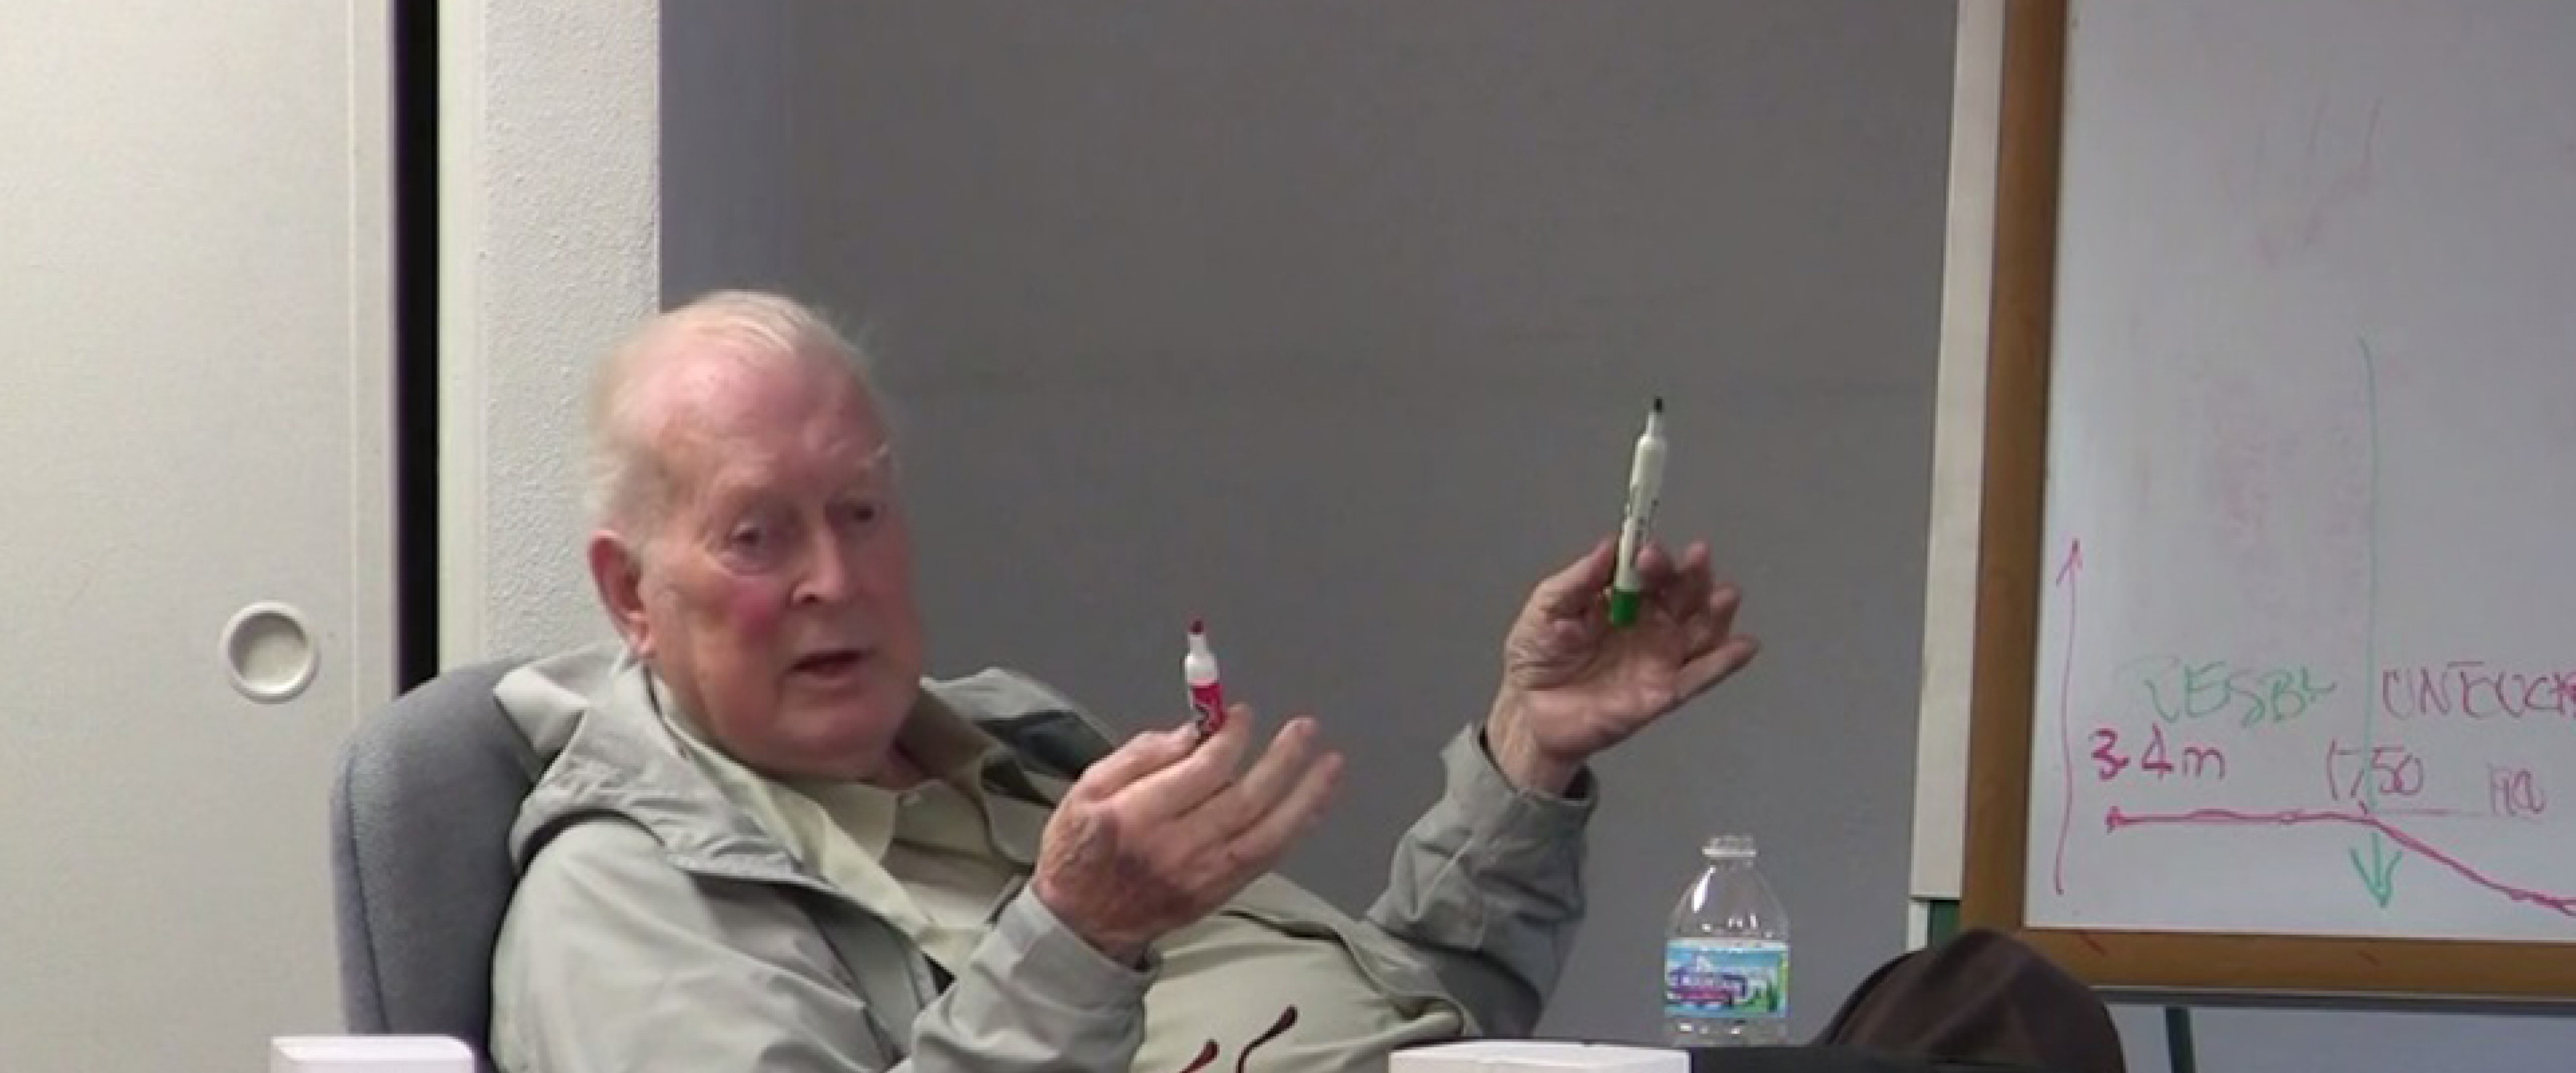 Dr. Michael Scriven speaking.